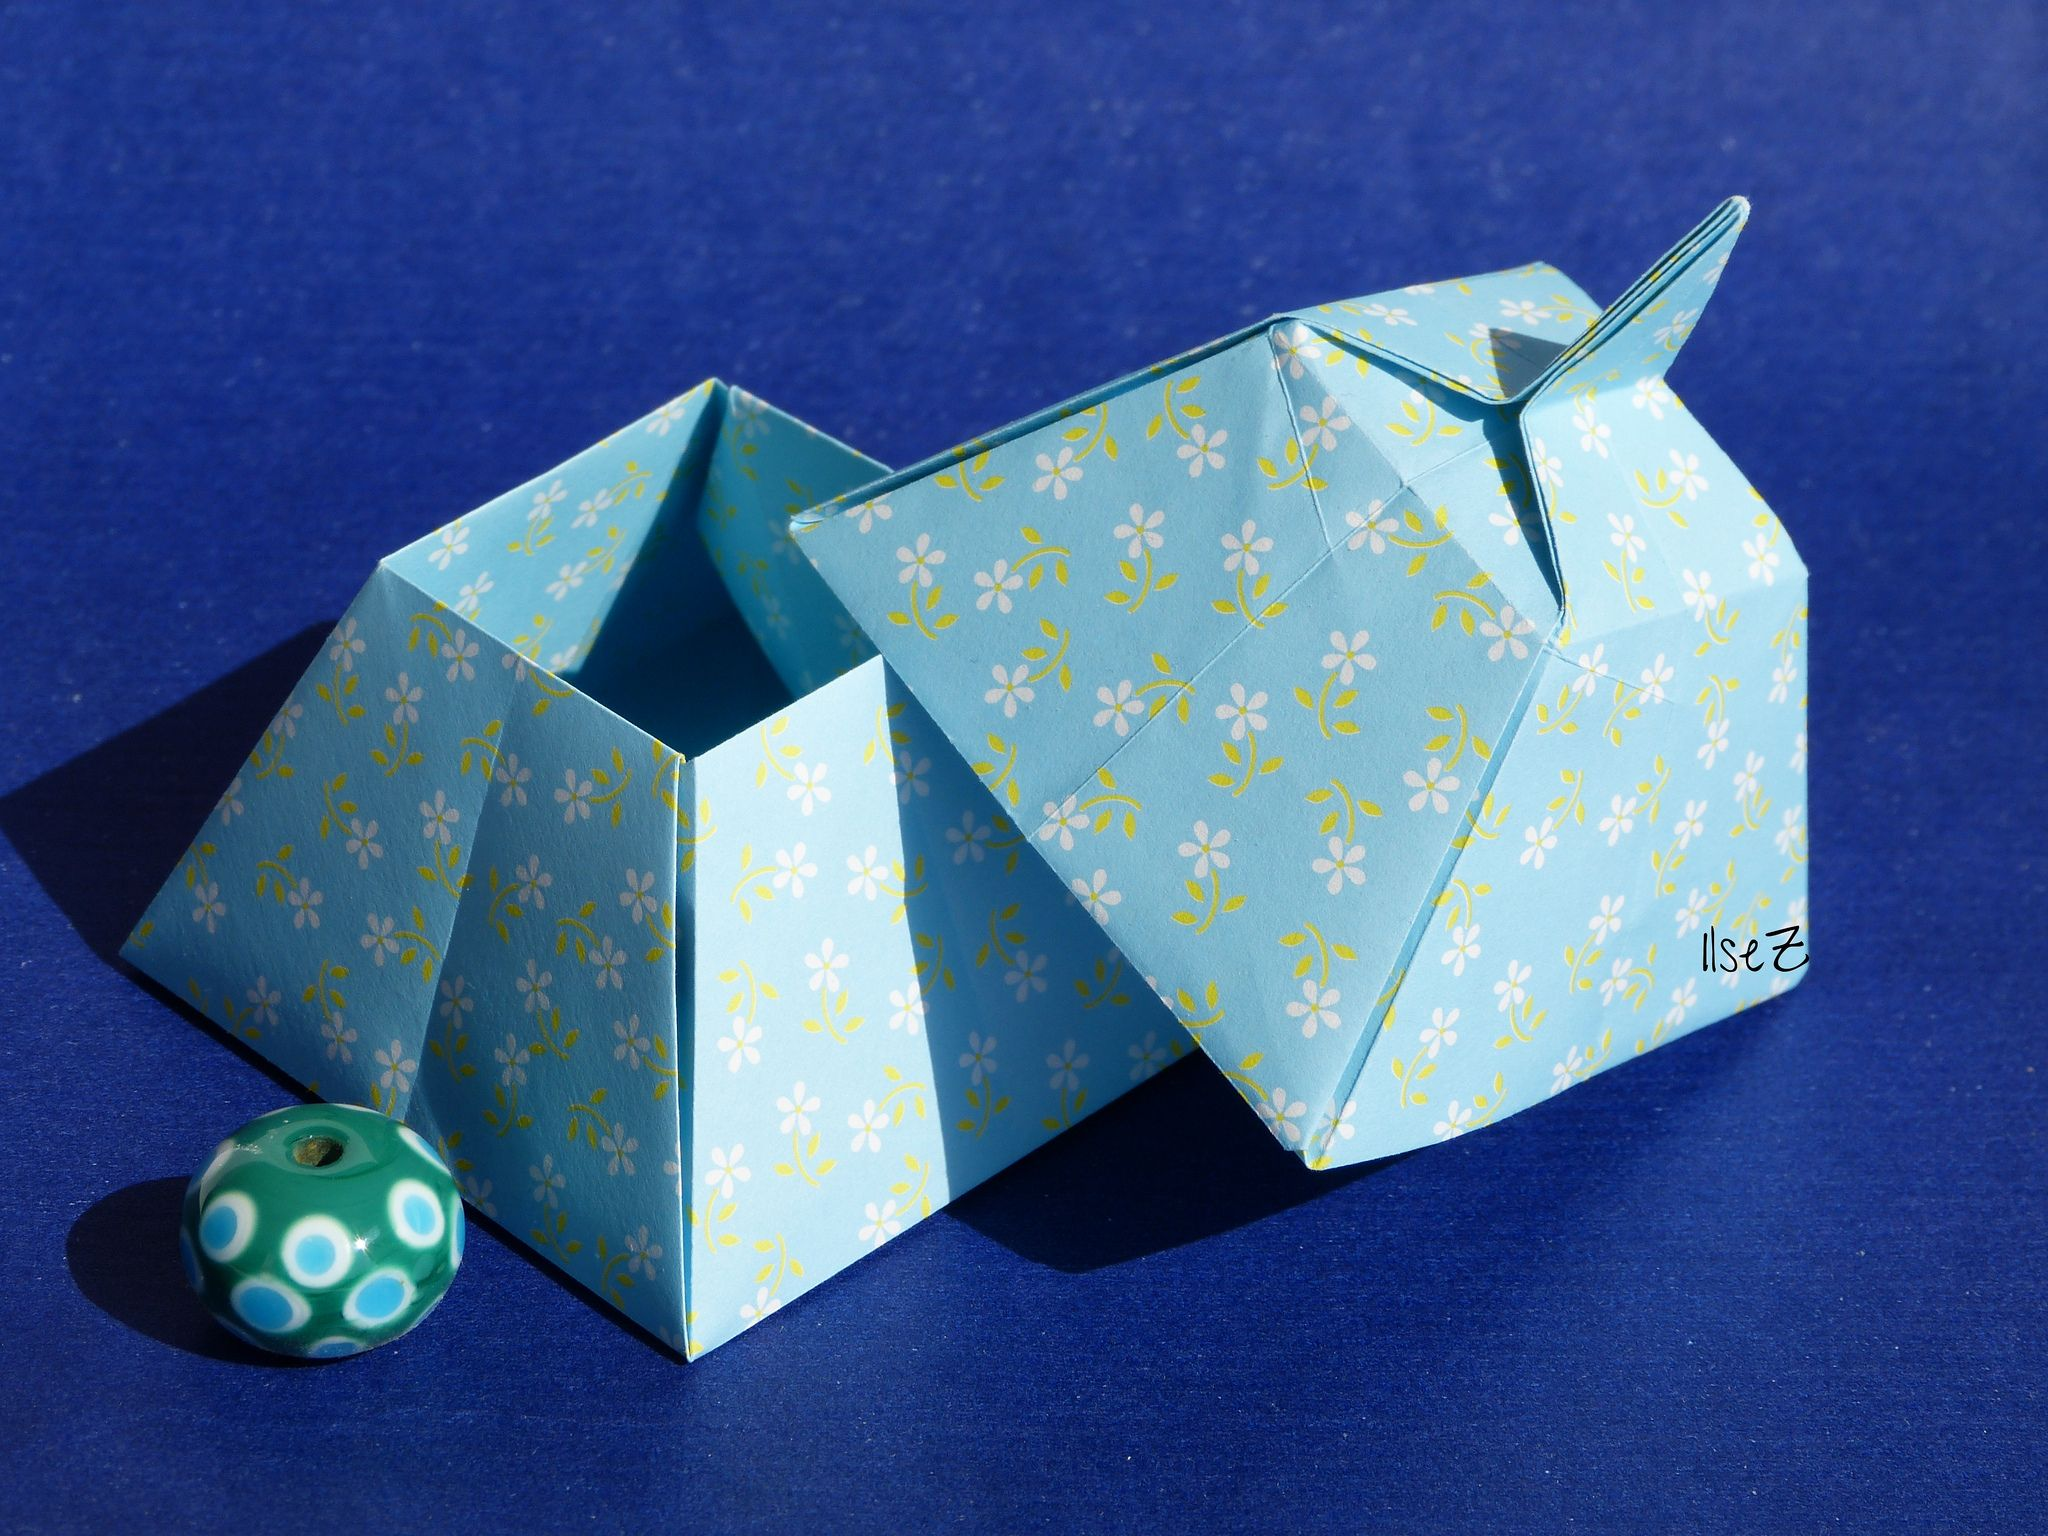 origami pyramid box by tomoko fuse [ 2048 x 1536 Pixel ]